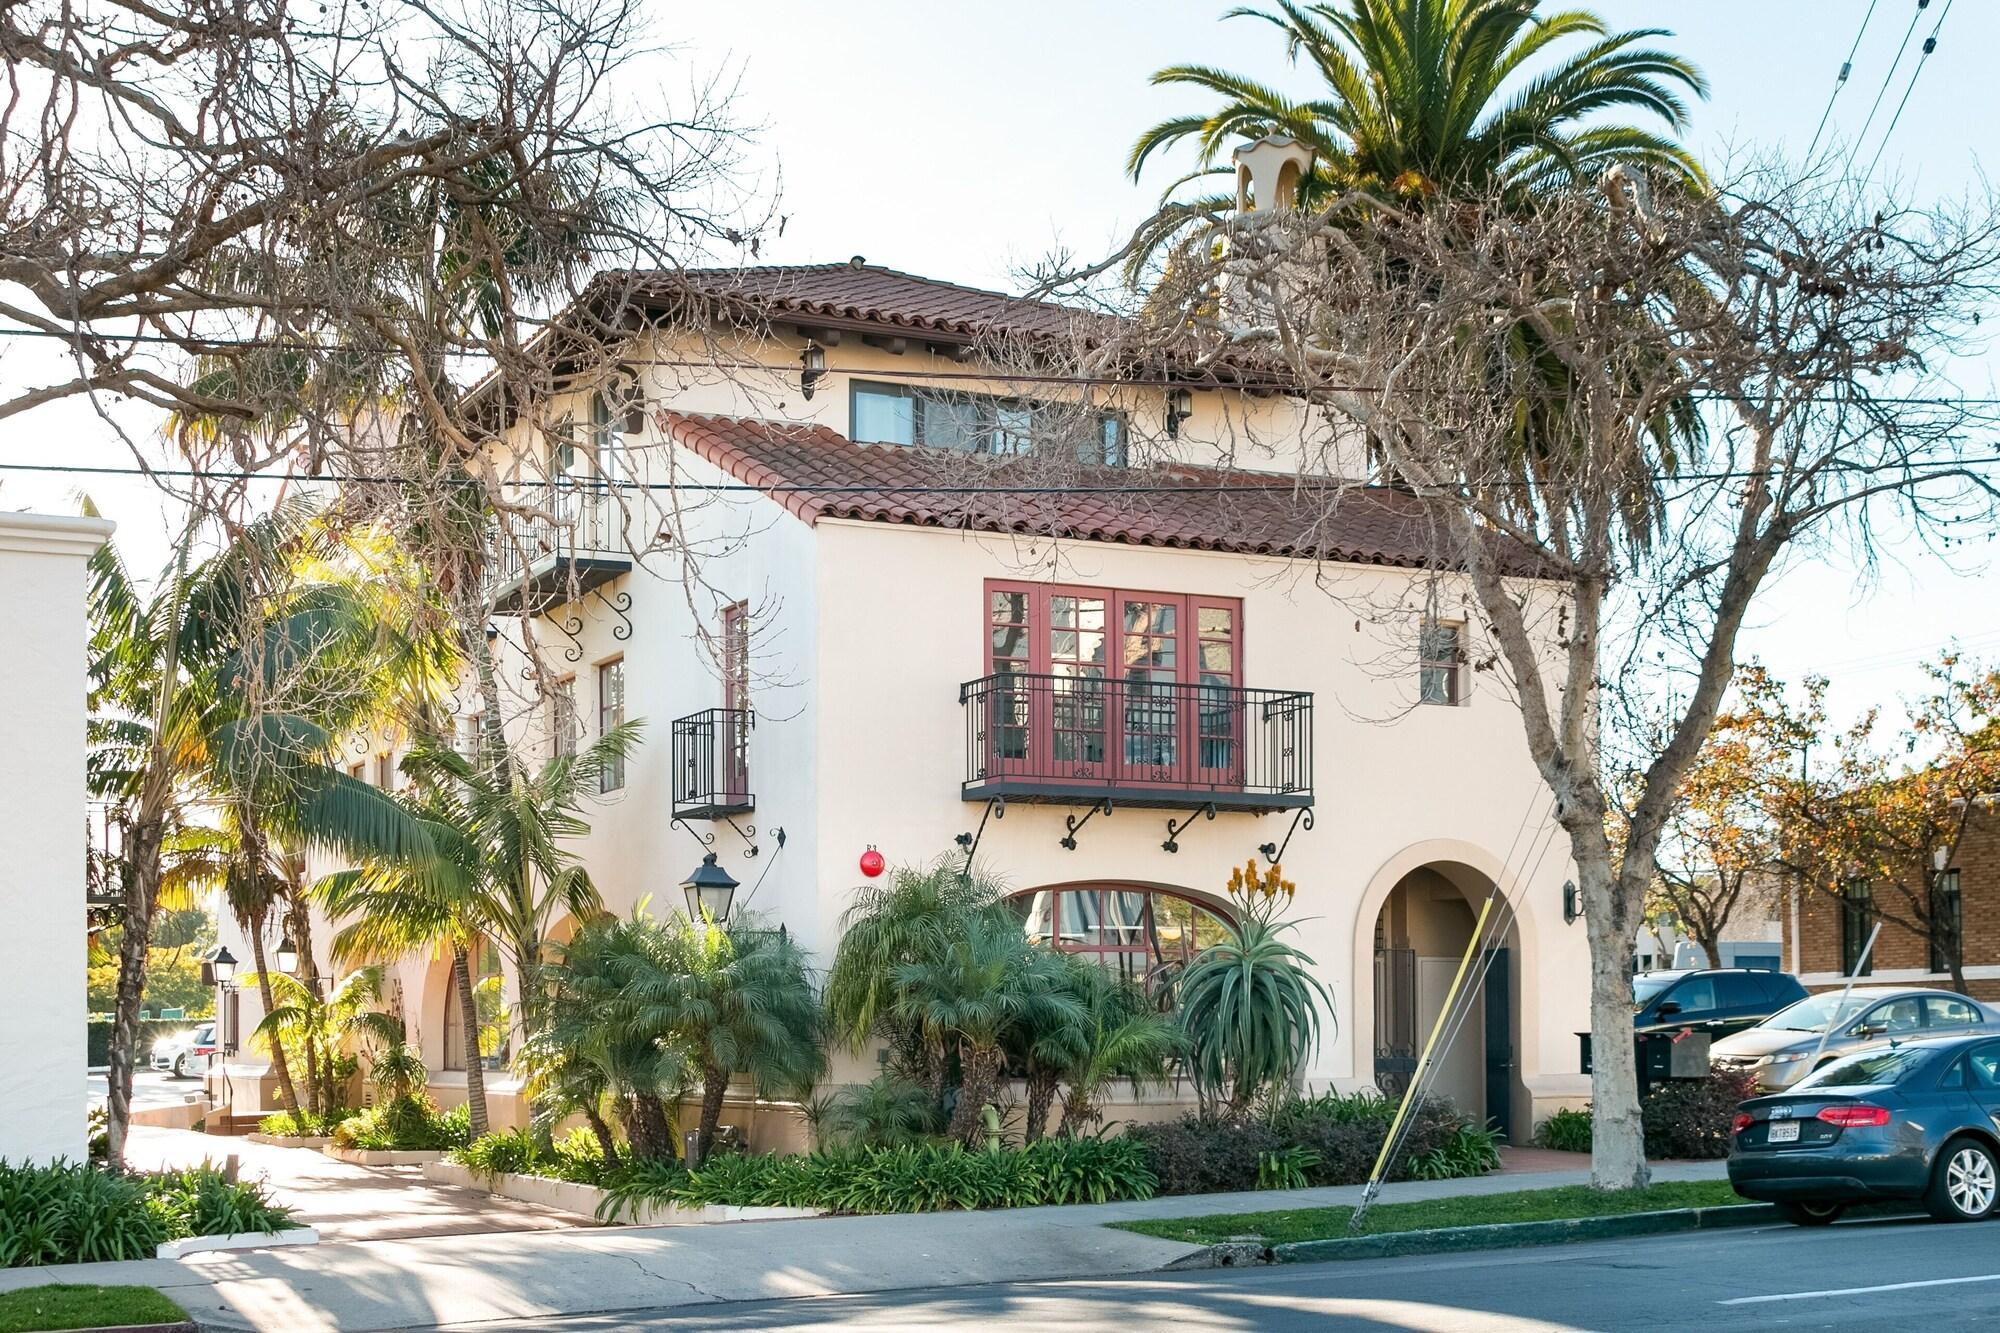 1221 Santa Barbara 2 Br Townhouse